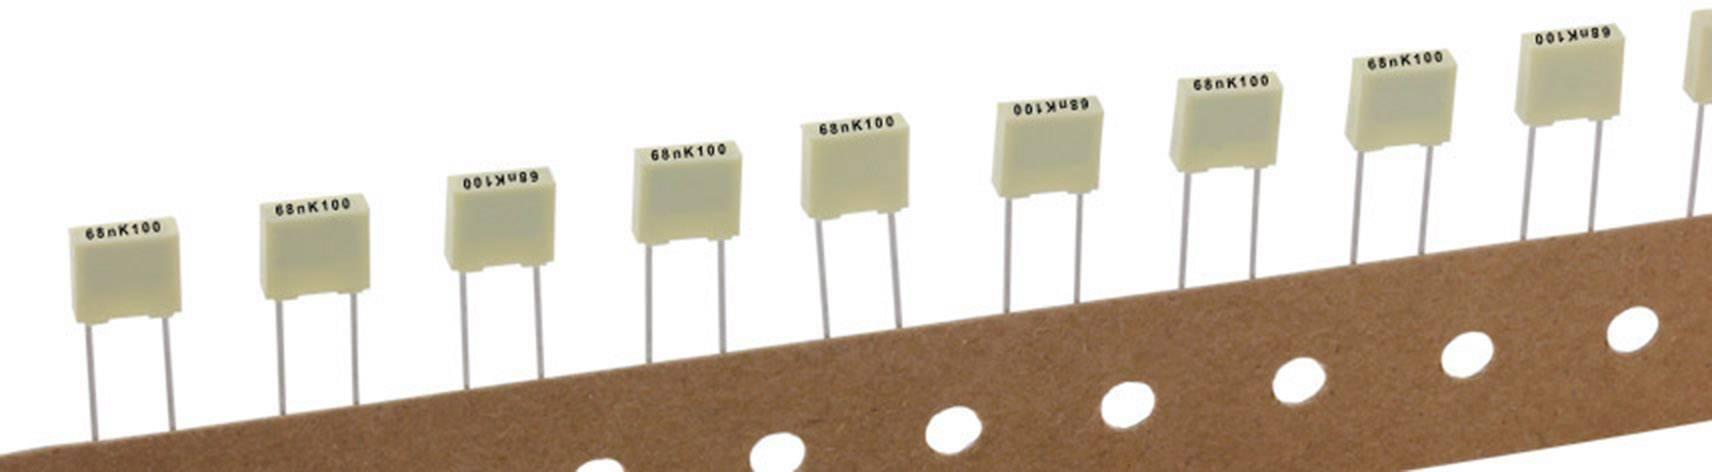 Polyesterový kondenzátor Kemet R82DC3680DQ60K+ radiálne vývody, 680 nF, 63 V,10 %, 5 mm, (d x š x v) 7.2 x 4.5 mm x 9.5 mm, 1 ks